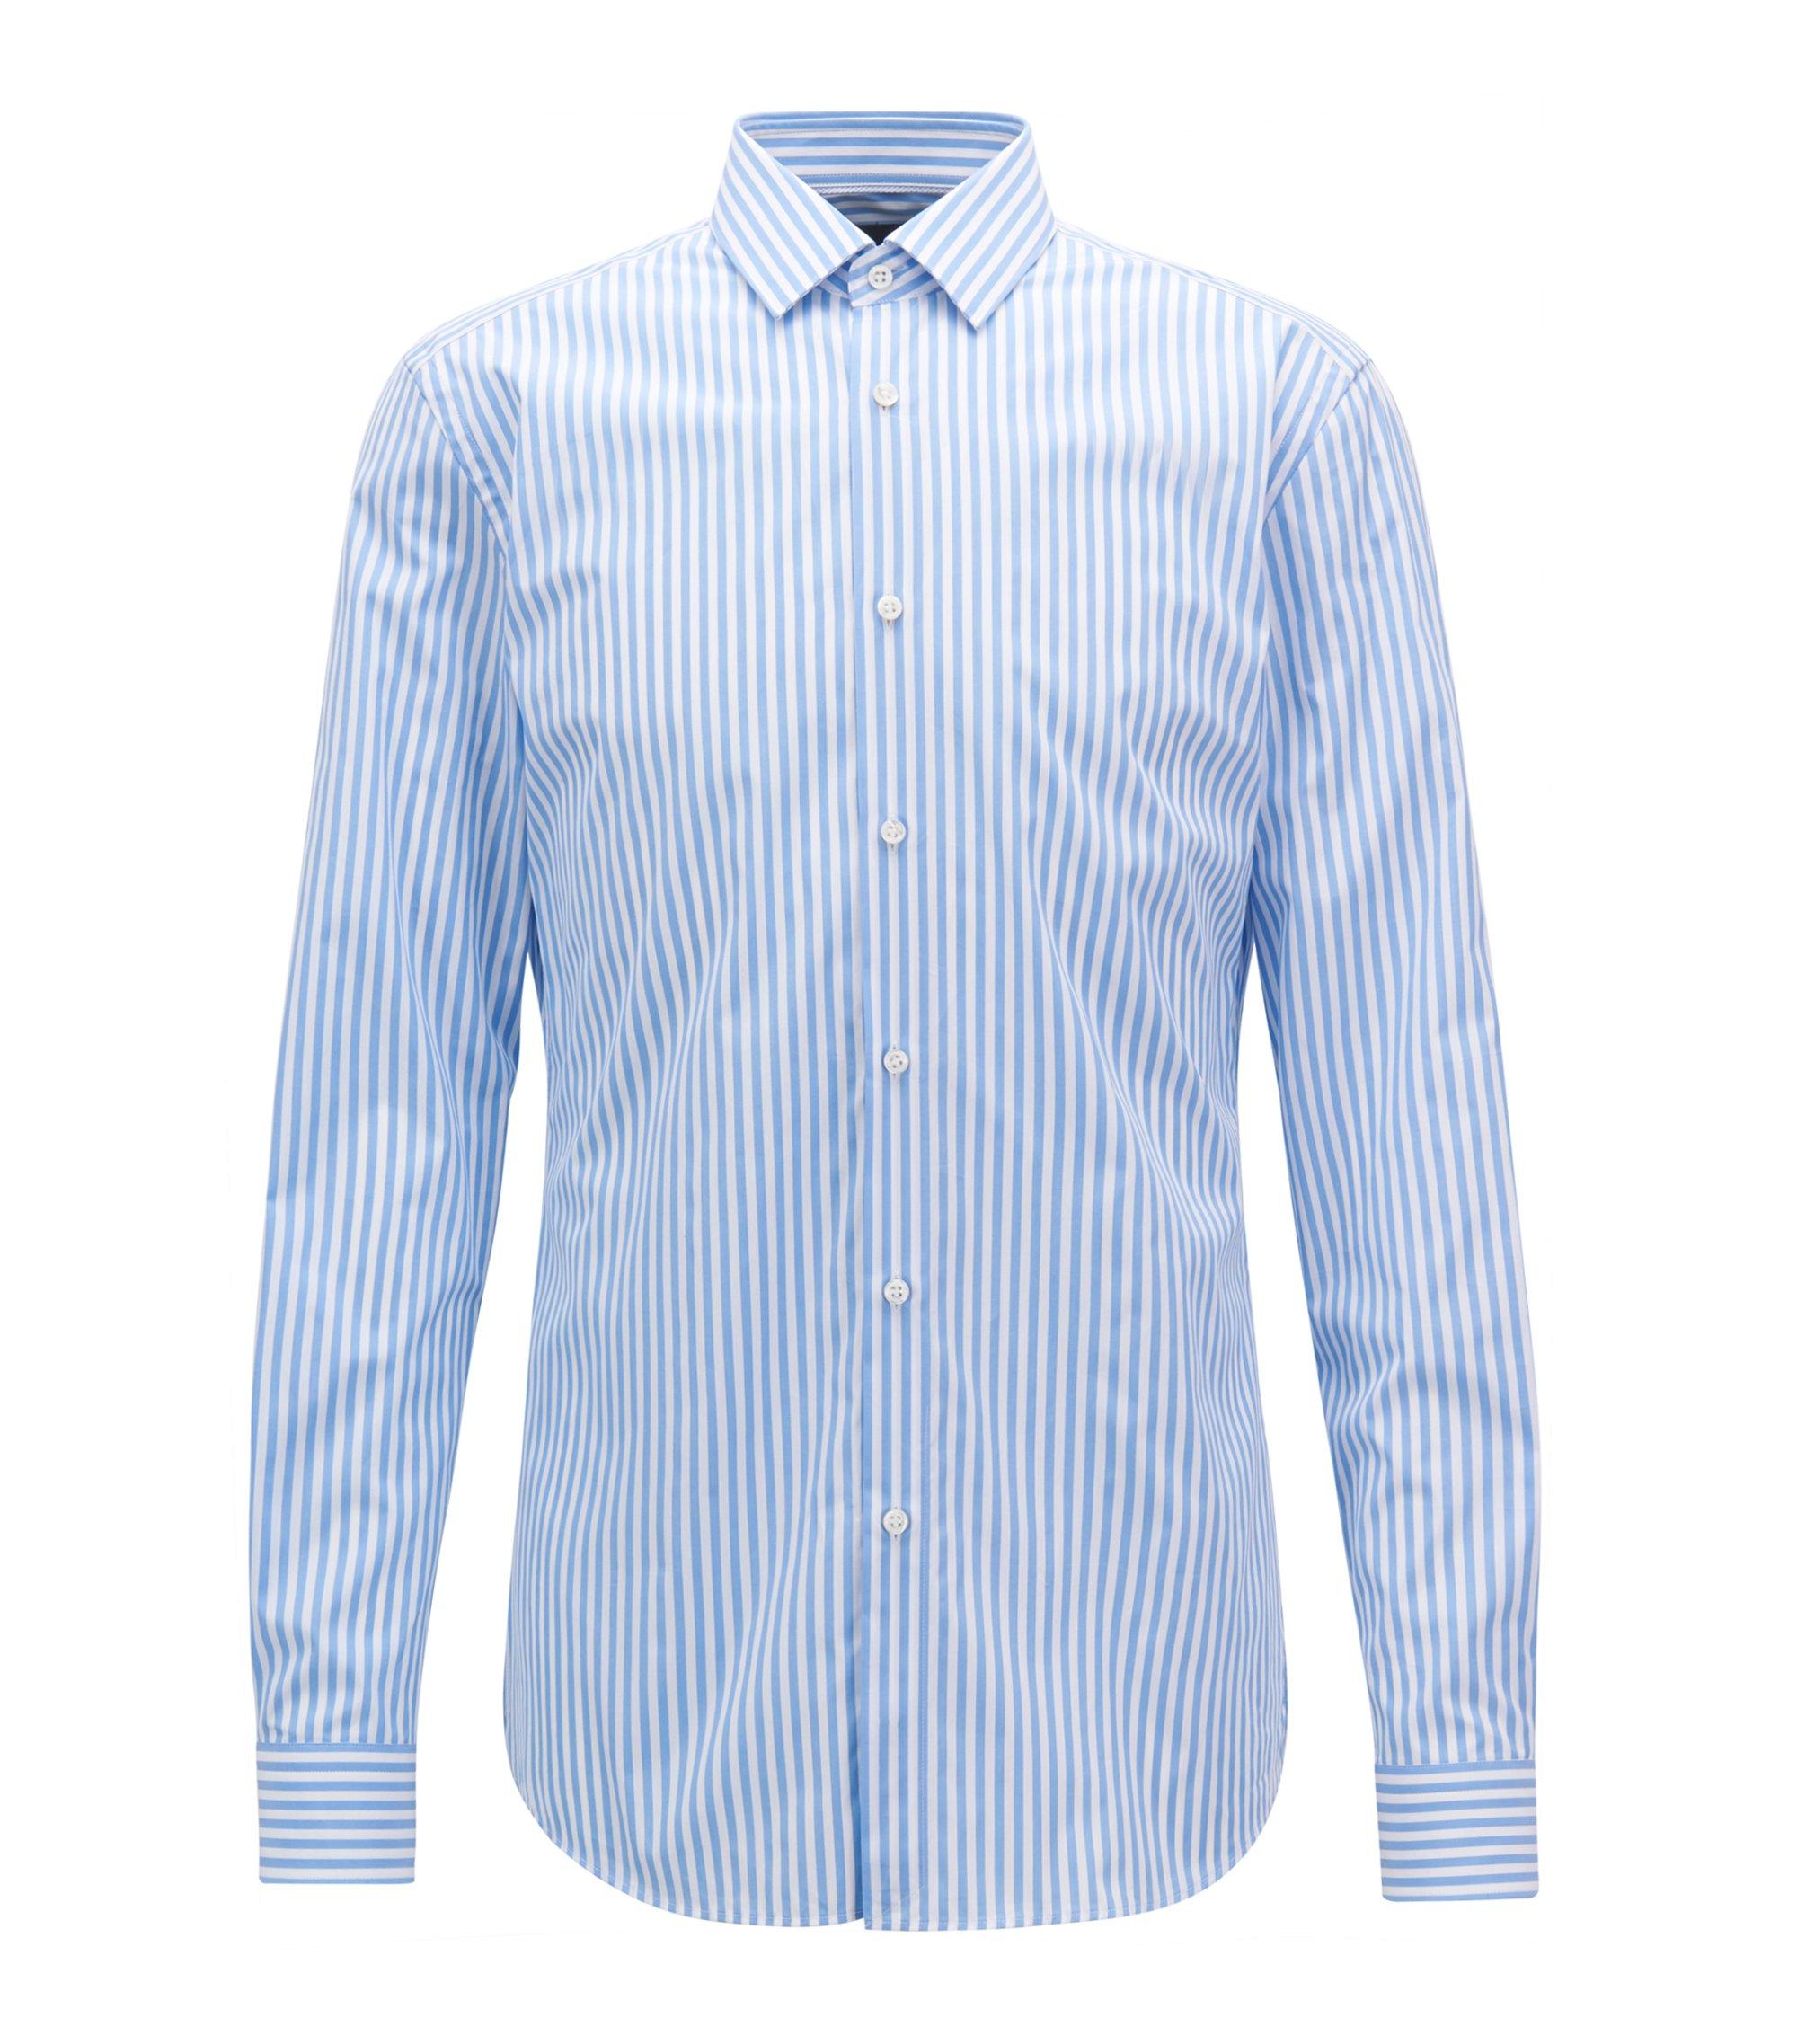 Striped Cotton Dress Shirt, Slim Fit | T-Scott, Light Blue